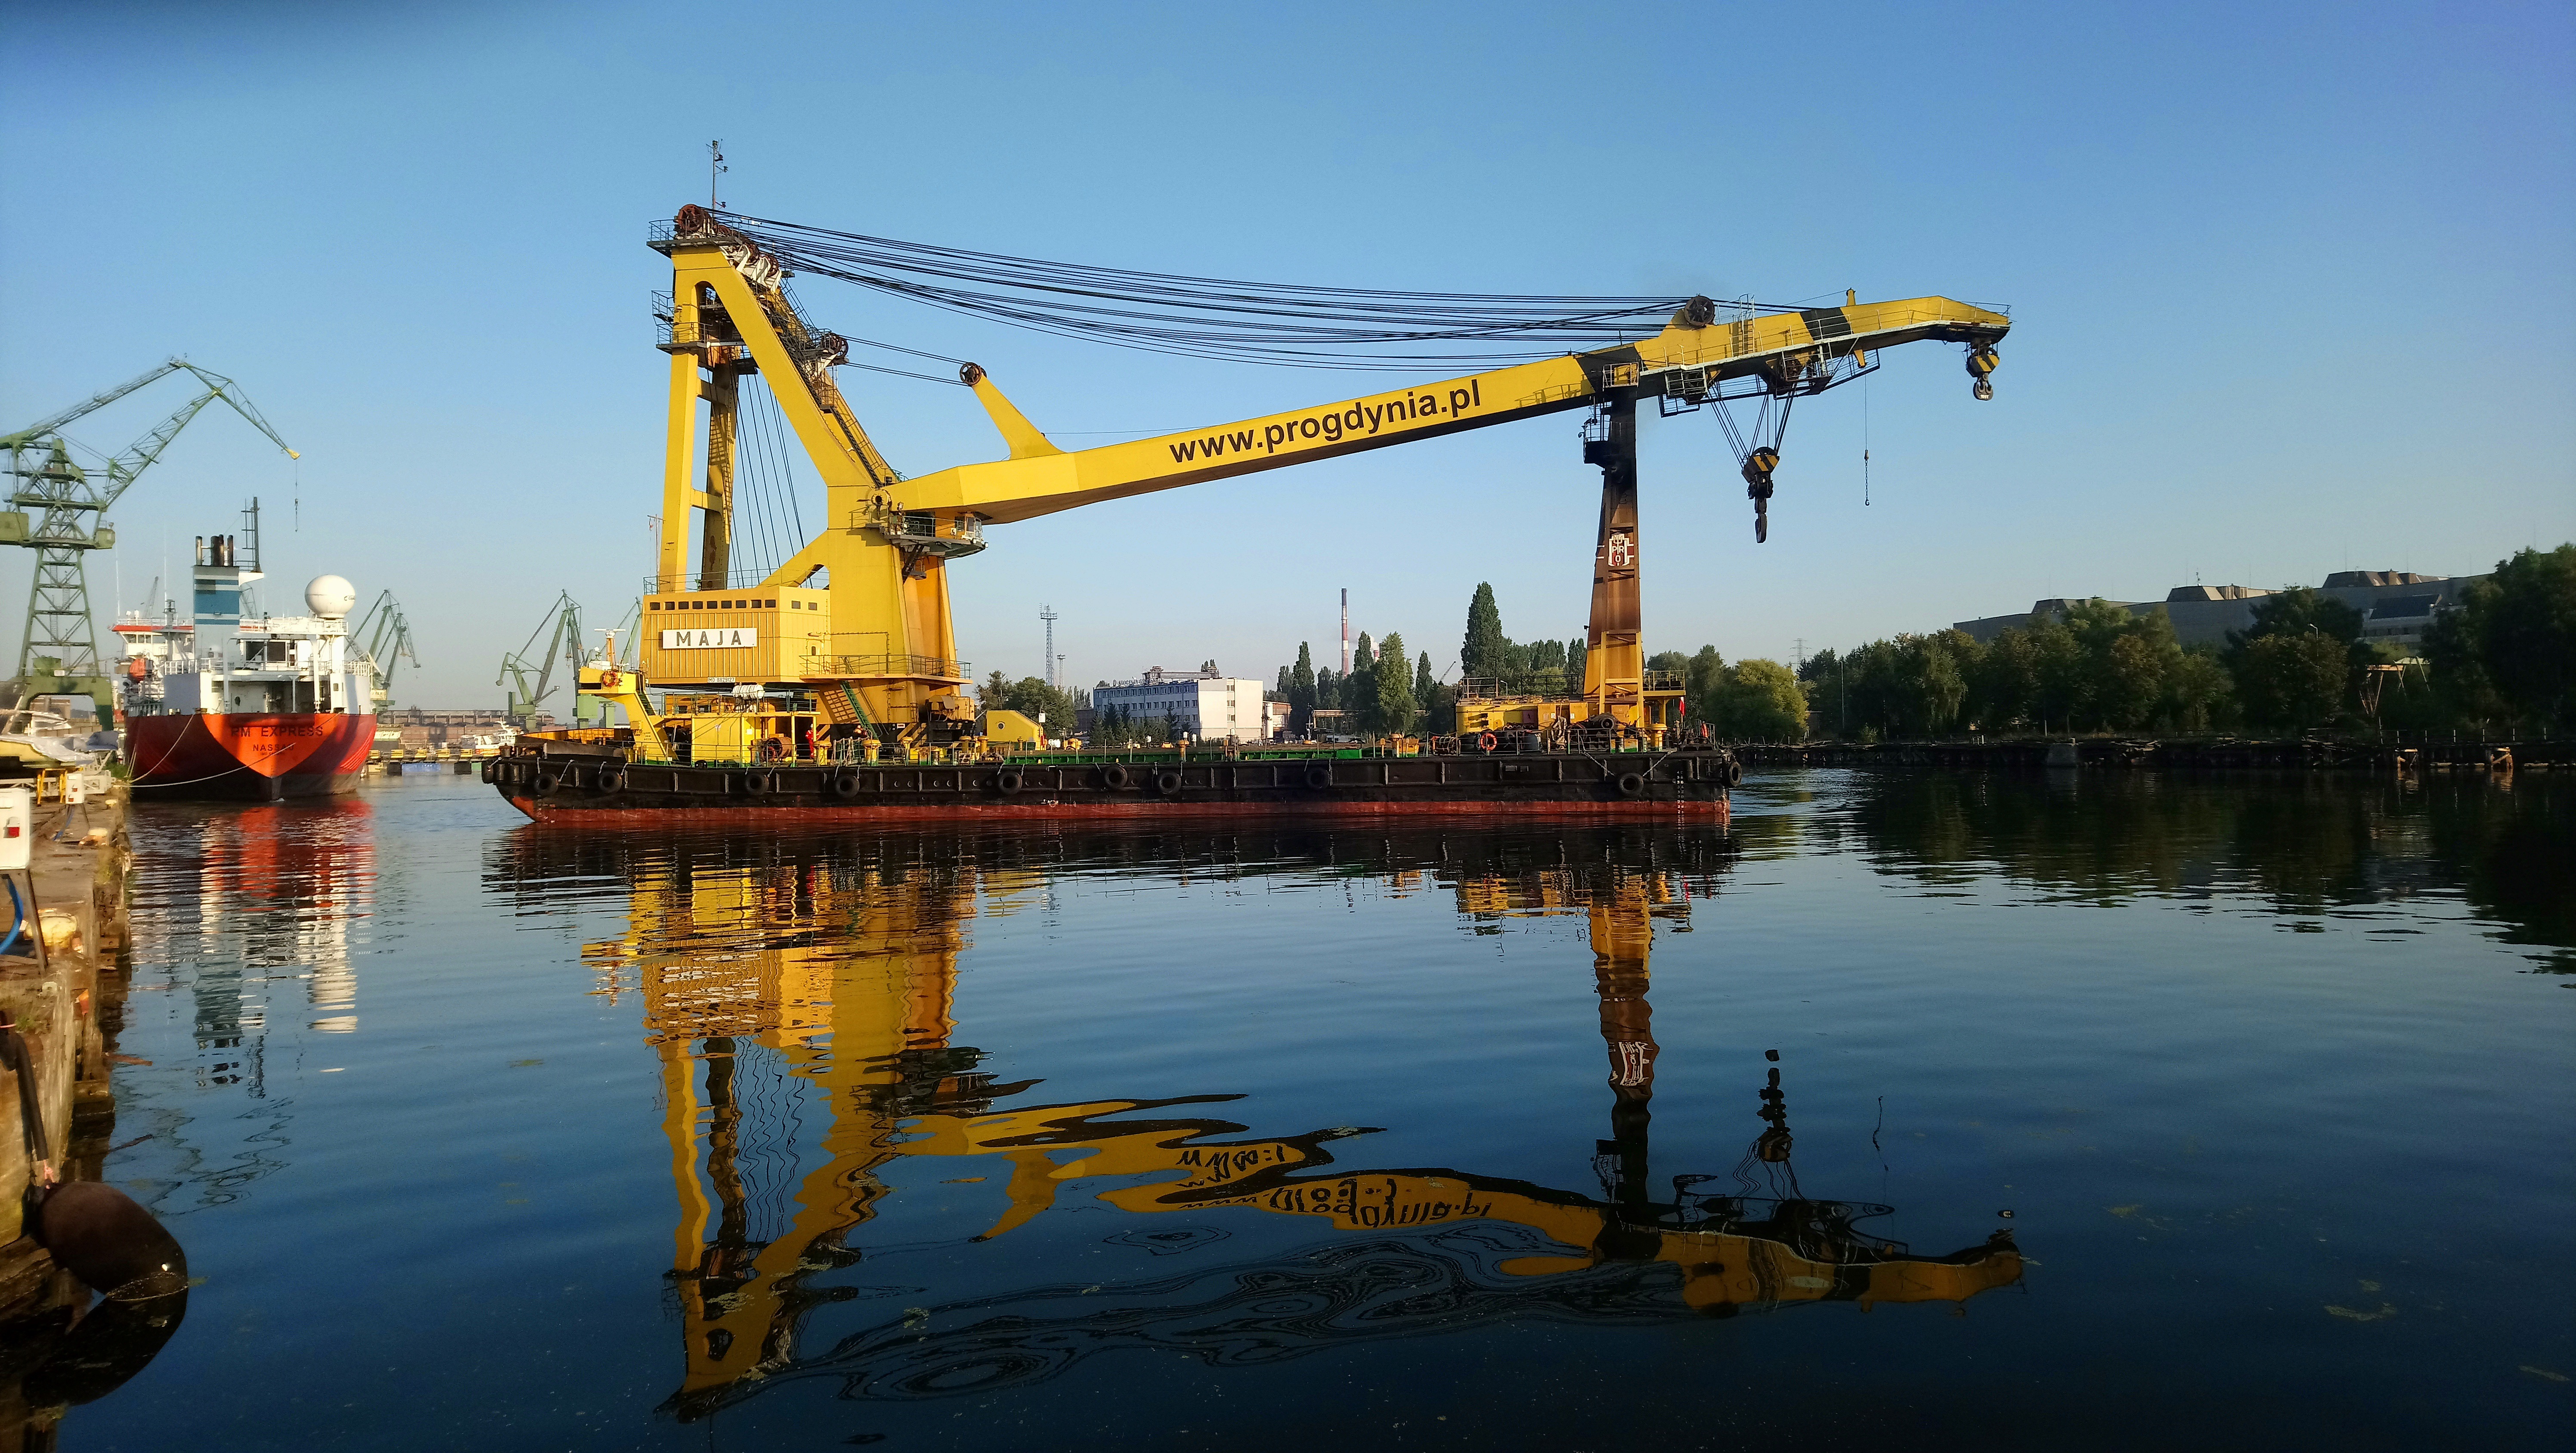 Maja - stocznia gdanska 26.08.2019